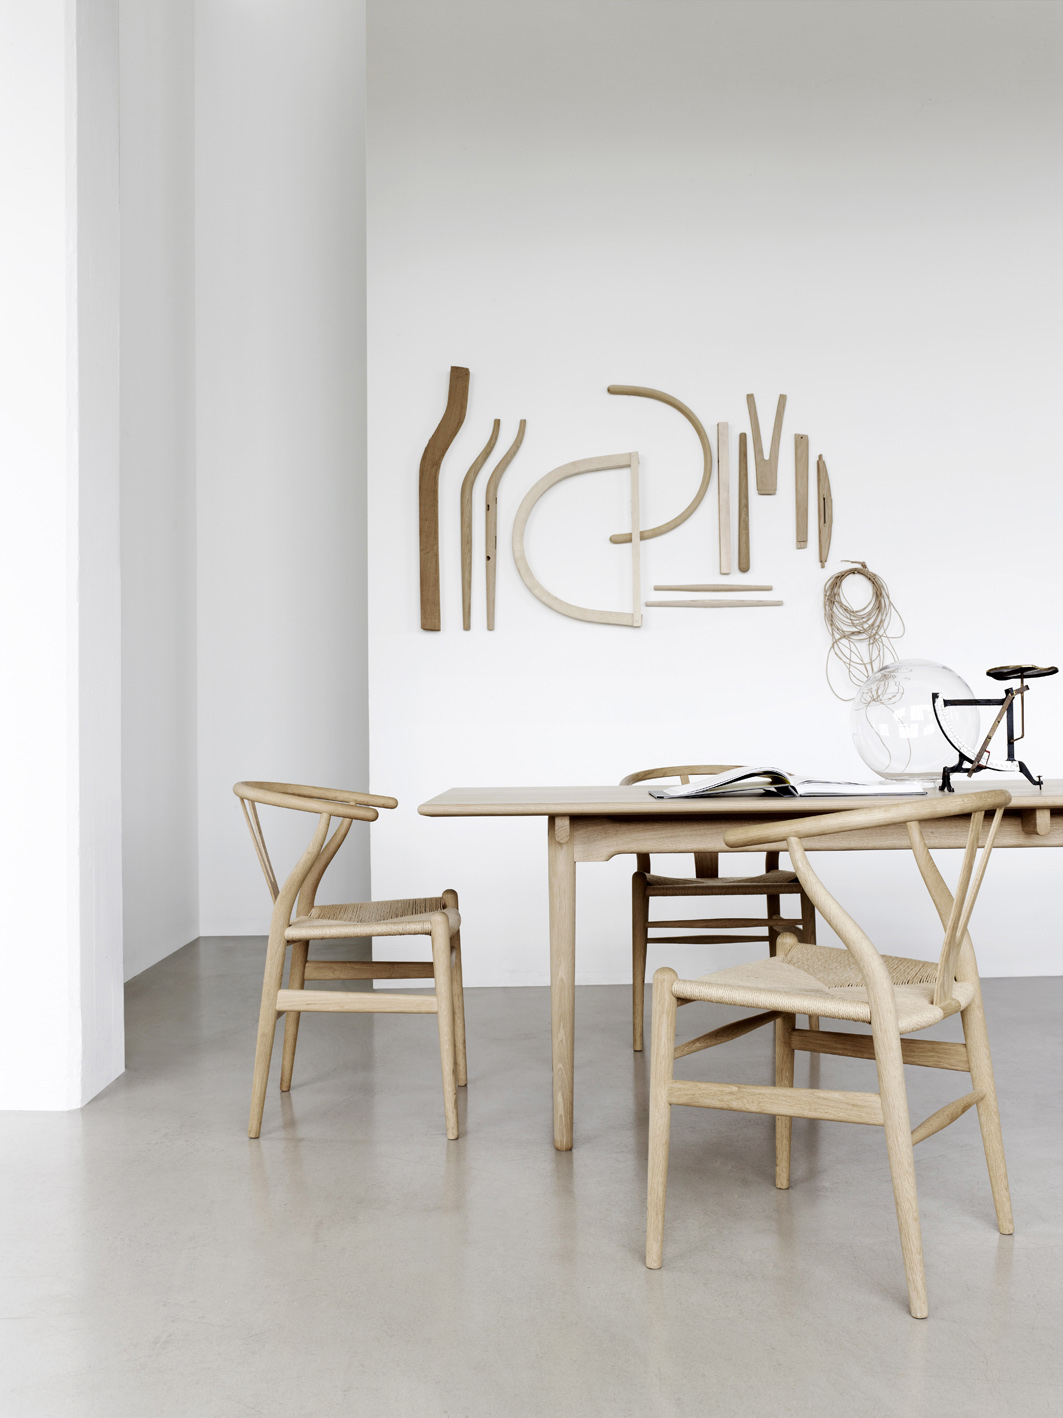 Carl hansen s n chaise wishbone ch24 hans j wegner for Scandic design